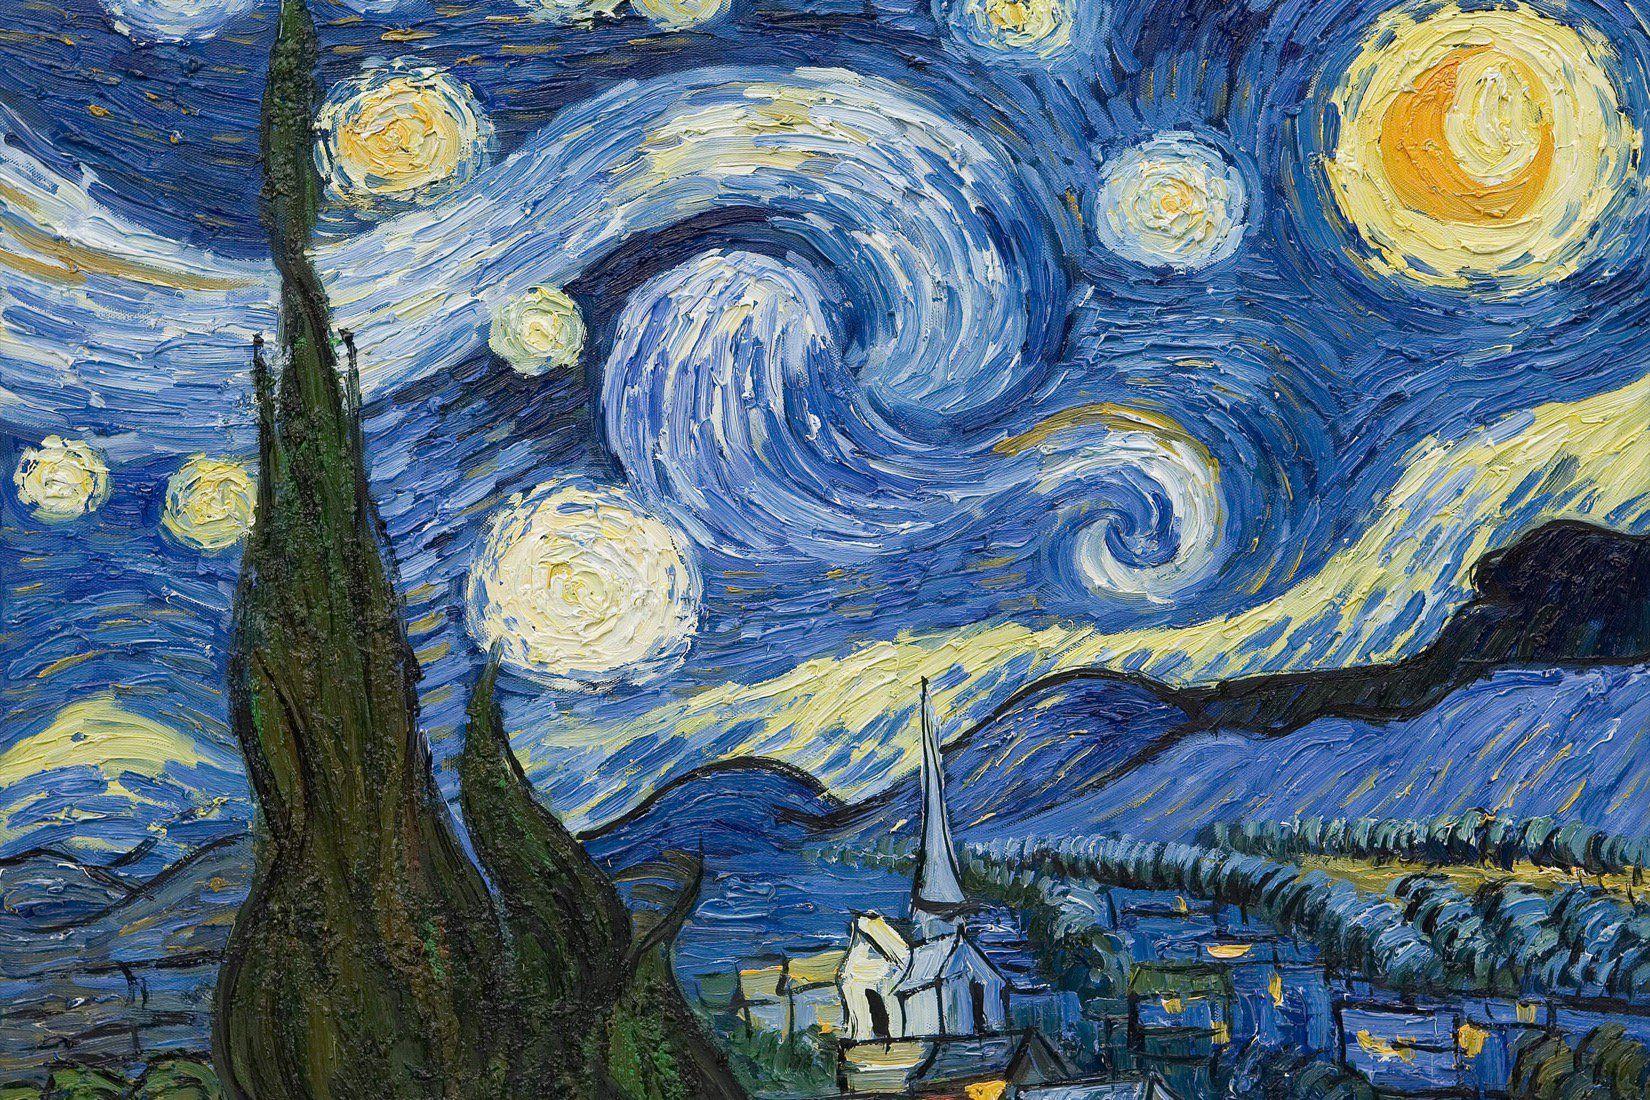 Van Gogh Starry Night Wallpaper Mural Murals Wallpaper In 2021 Starry Night Van Gogh Starry Night Painting Van Gogh Art